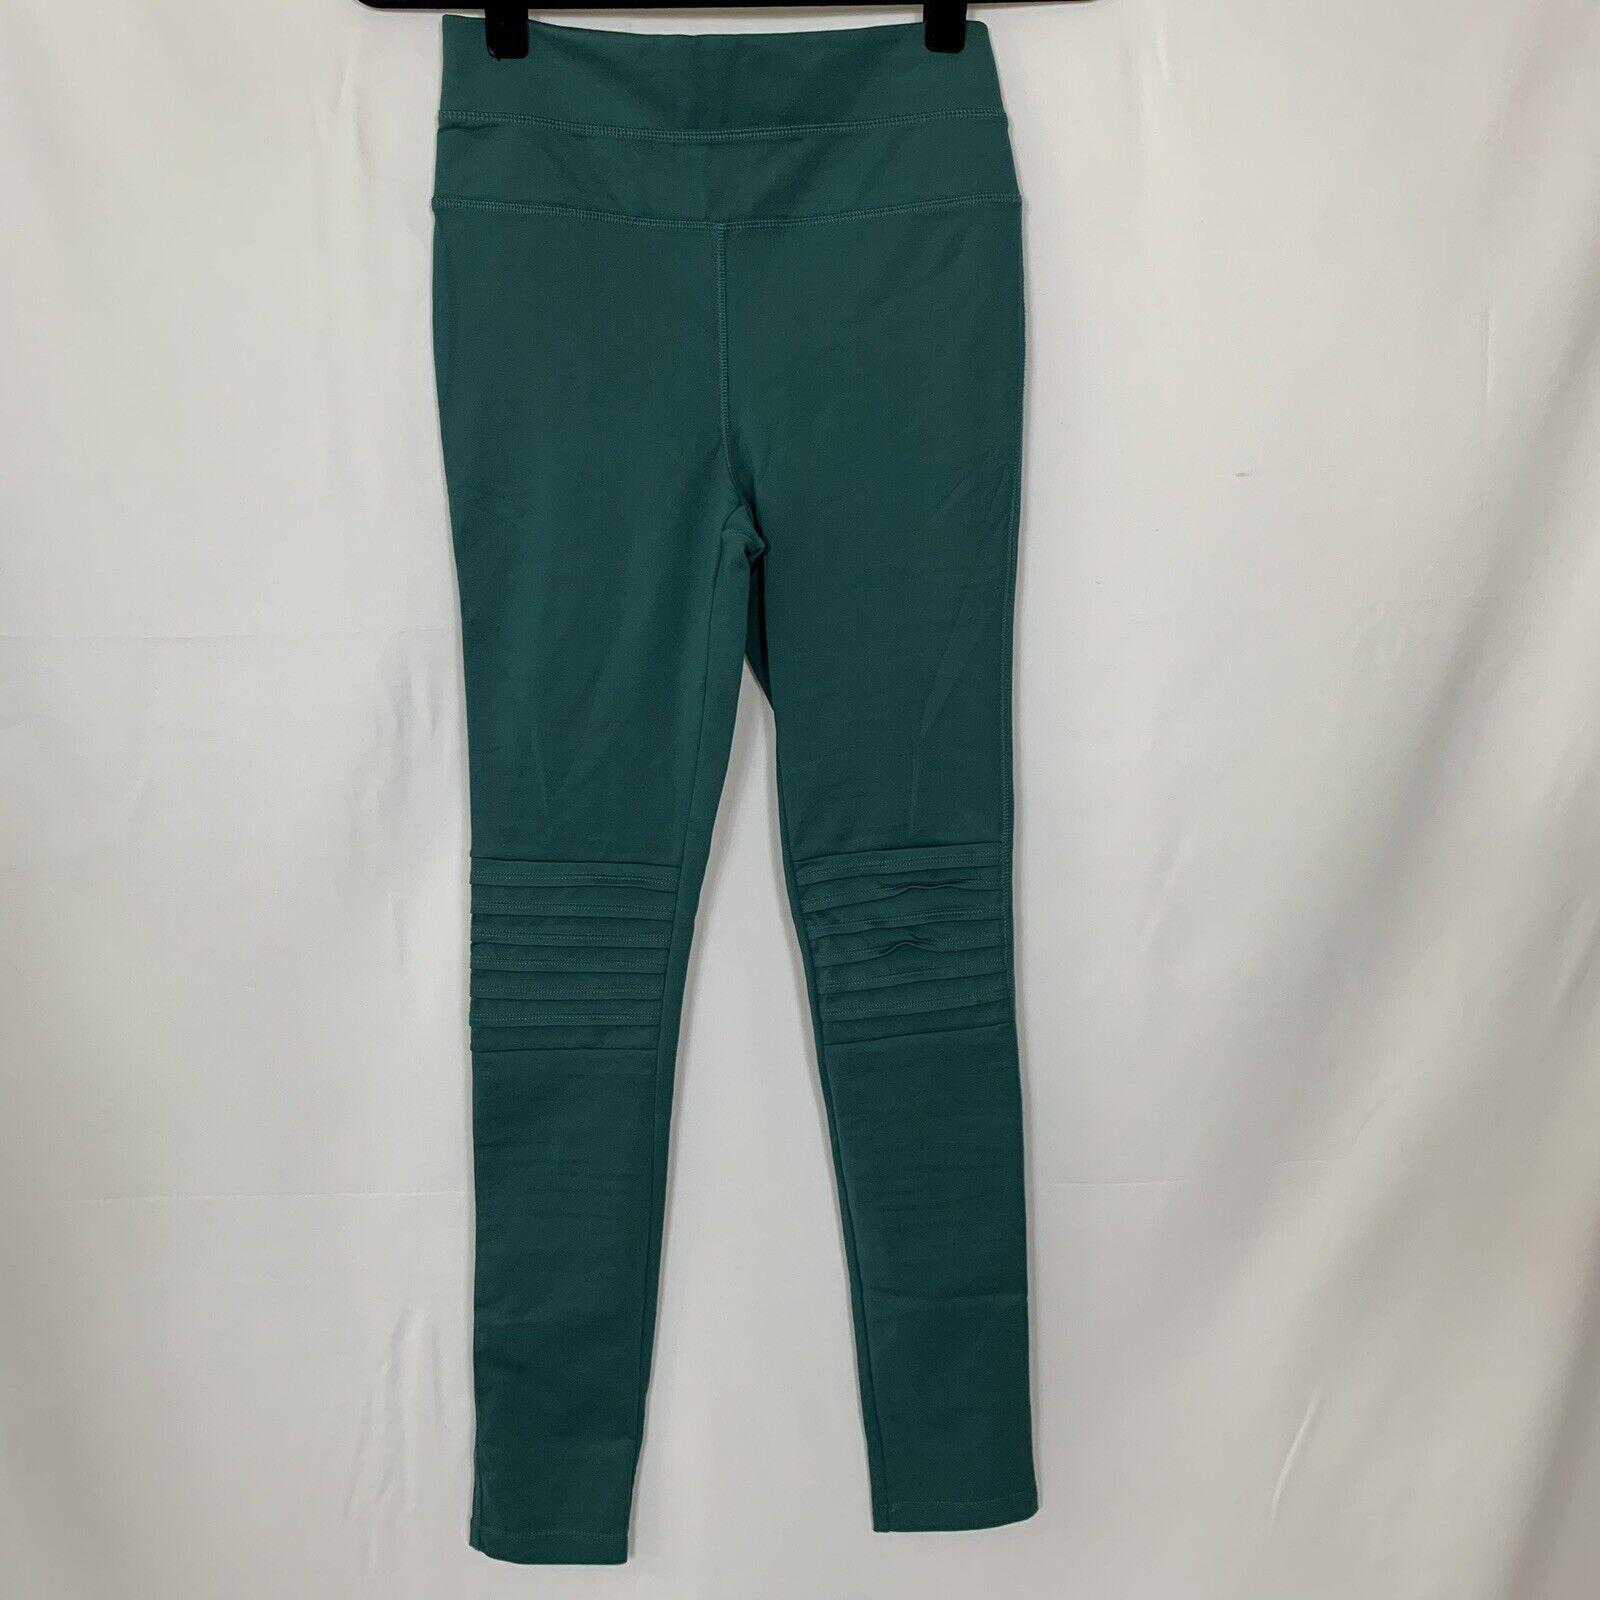 FP FREE PEOPLE MOVEMENT Women's Green High Waist Moto Leggings Yoga Pants Size S